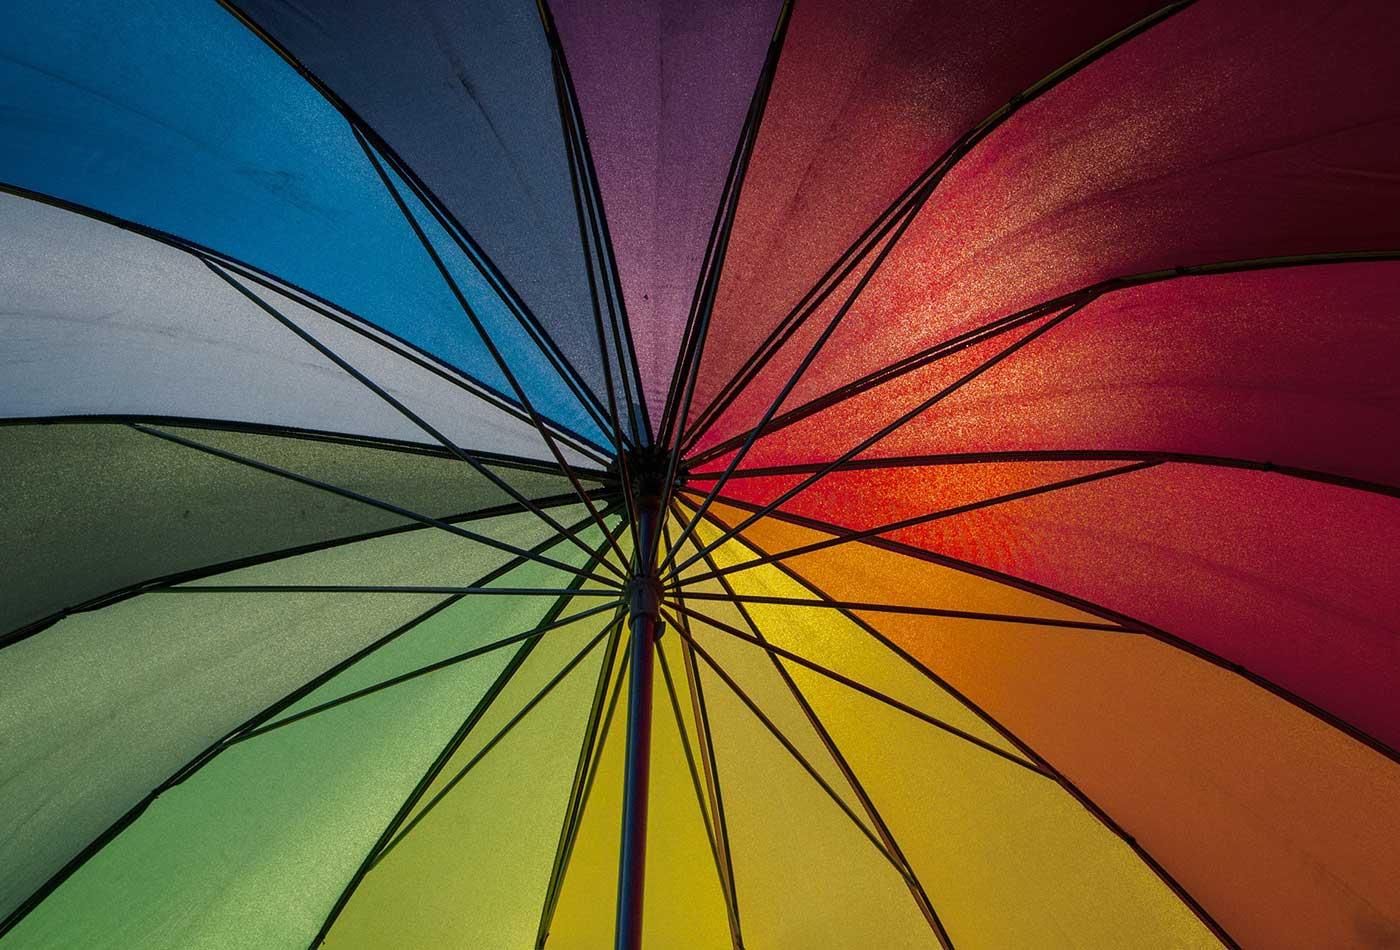 Rainbow parasol.